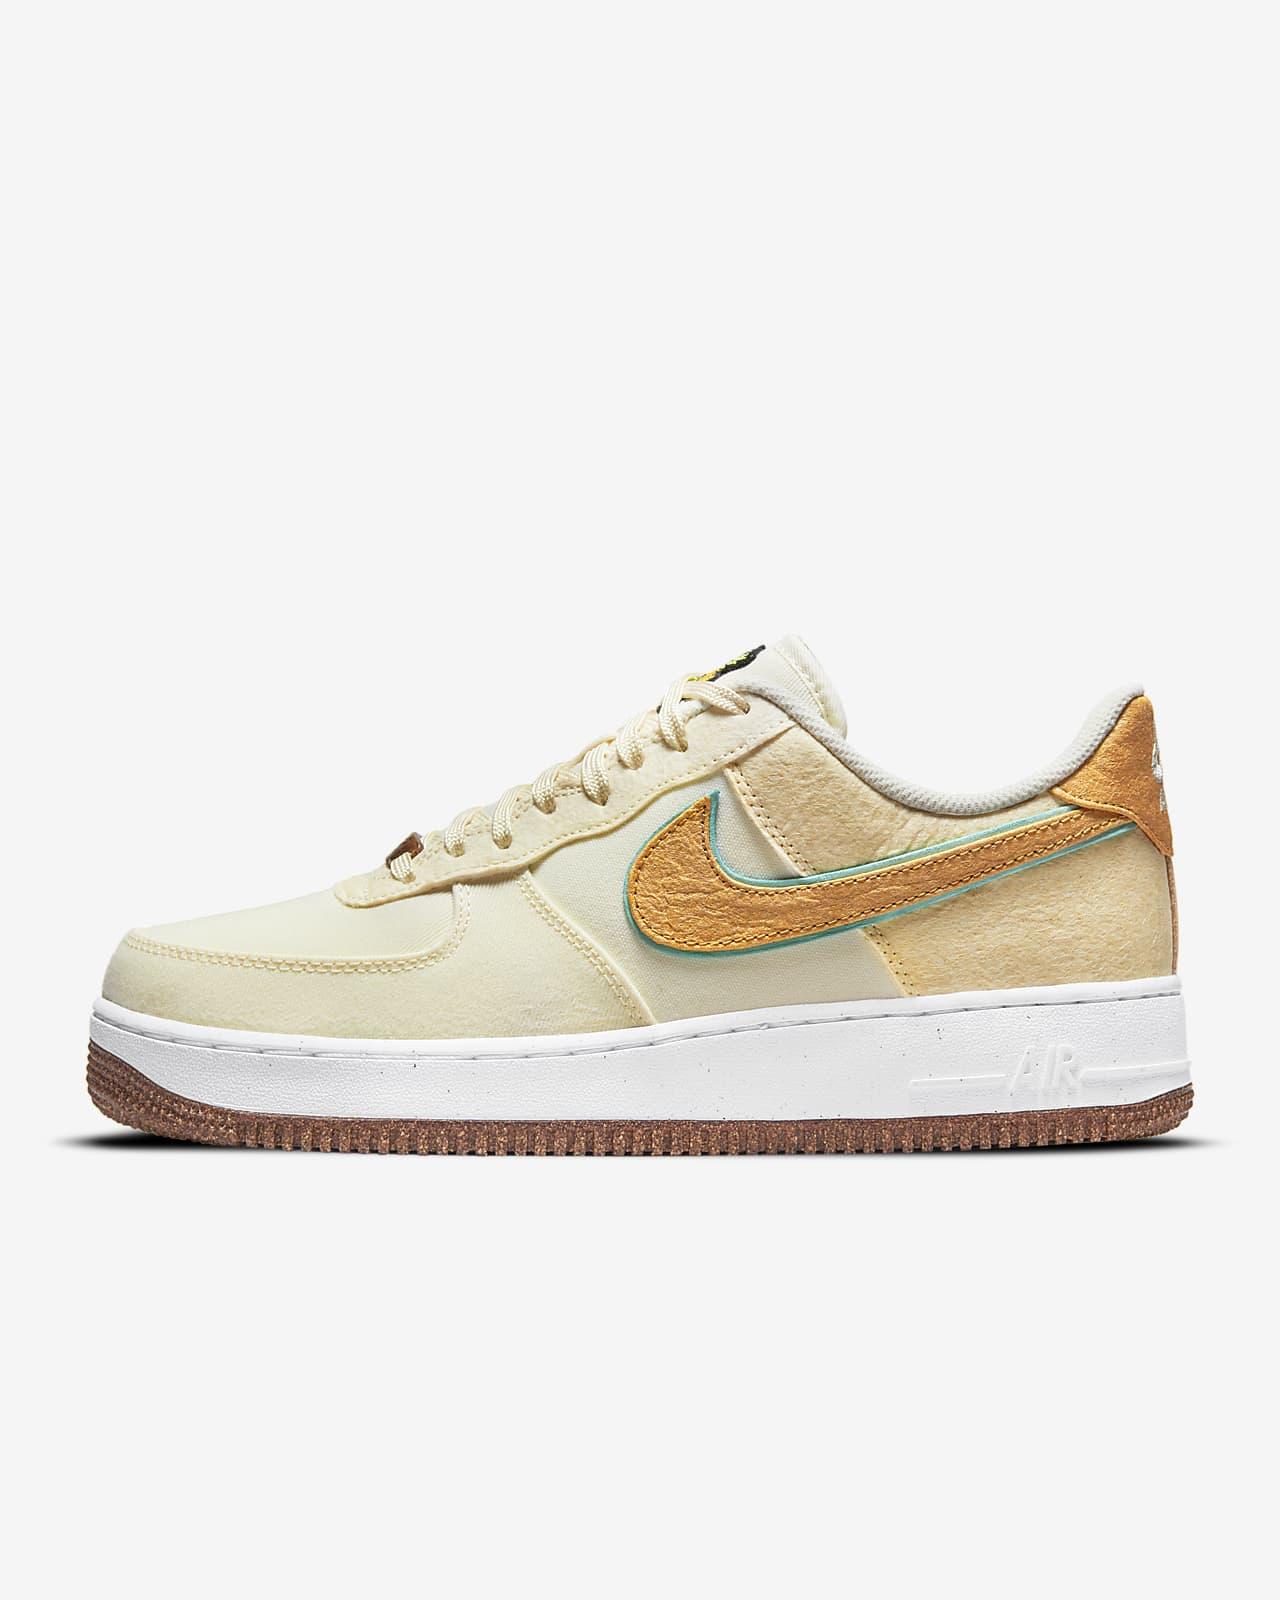 Nike Air Force 1 '07 Premium Shoes